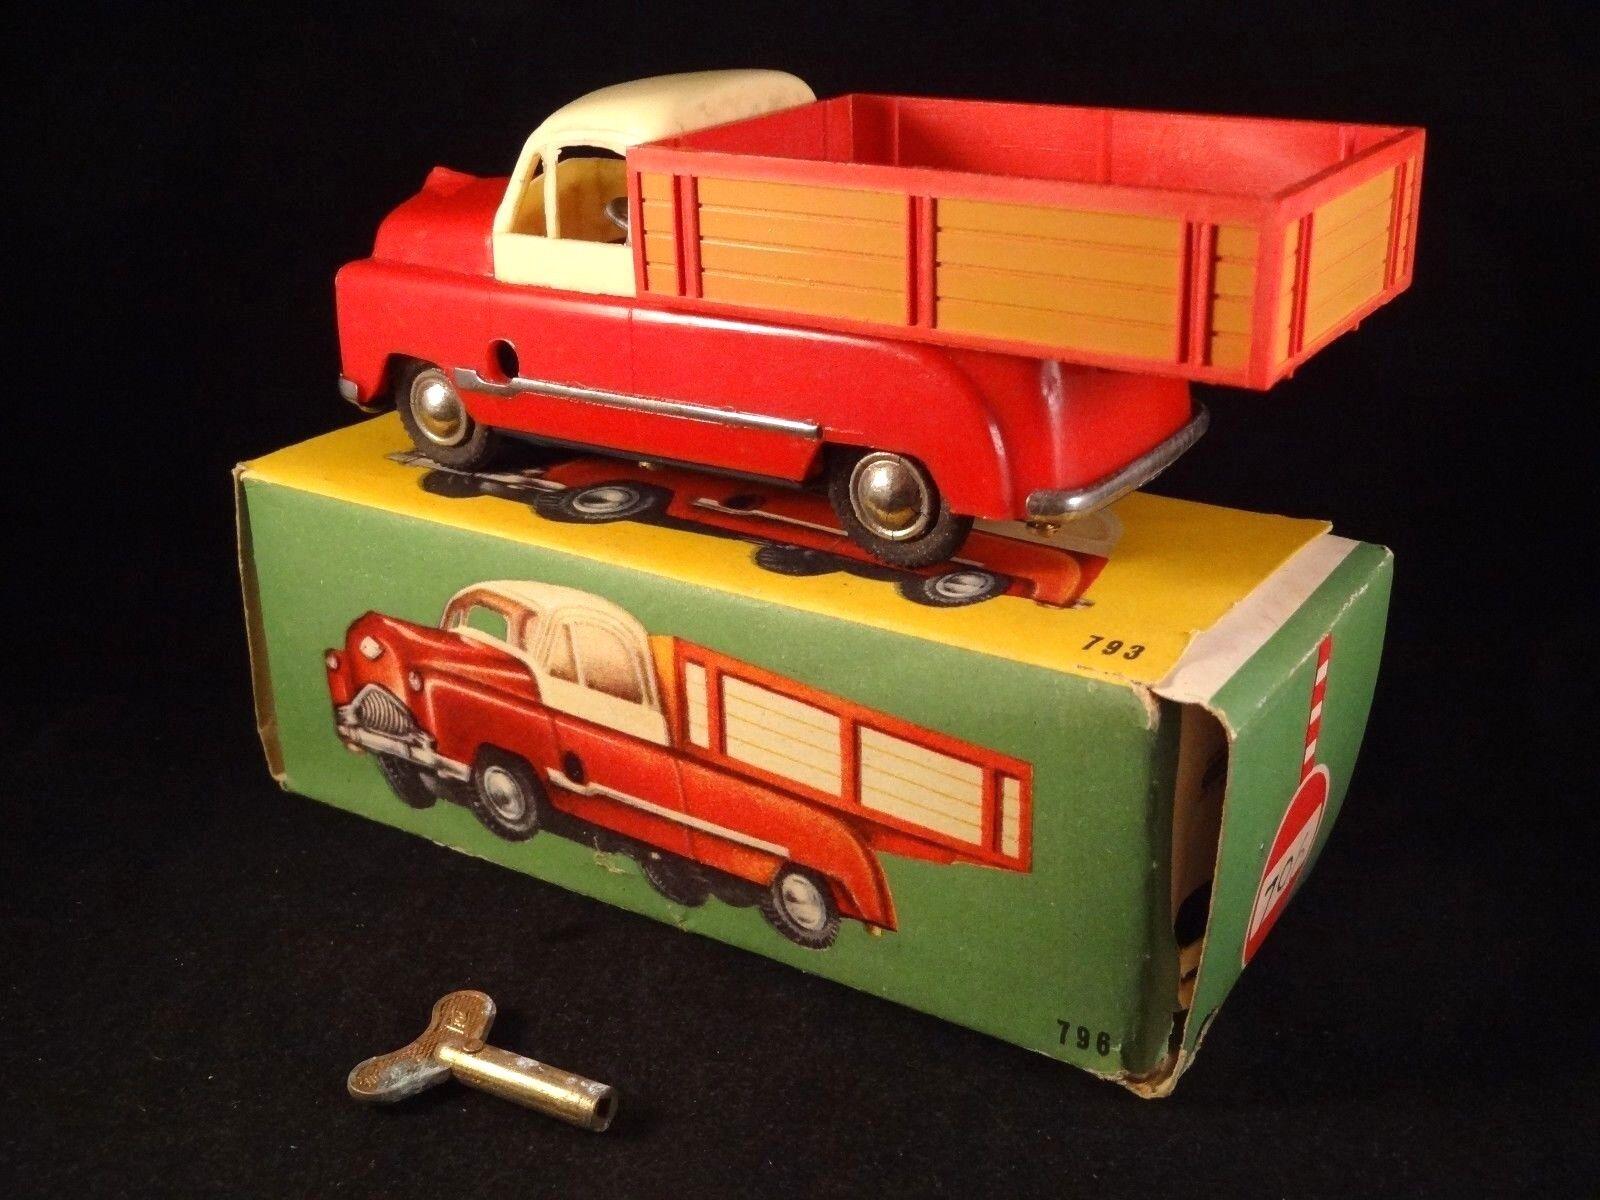 Ancien jouet camion benne mécanique boîte d'origine Made in Spain PAYA 1950 60